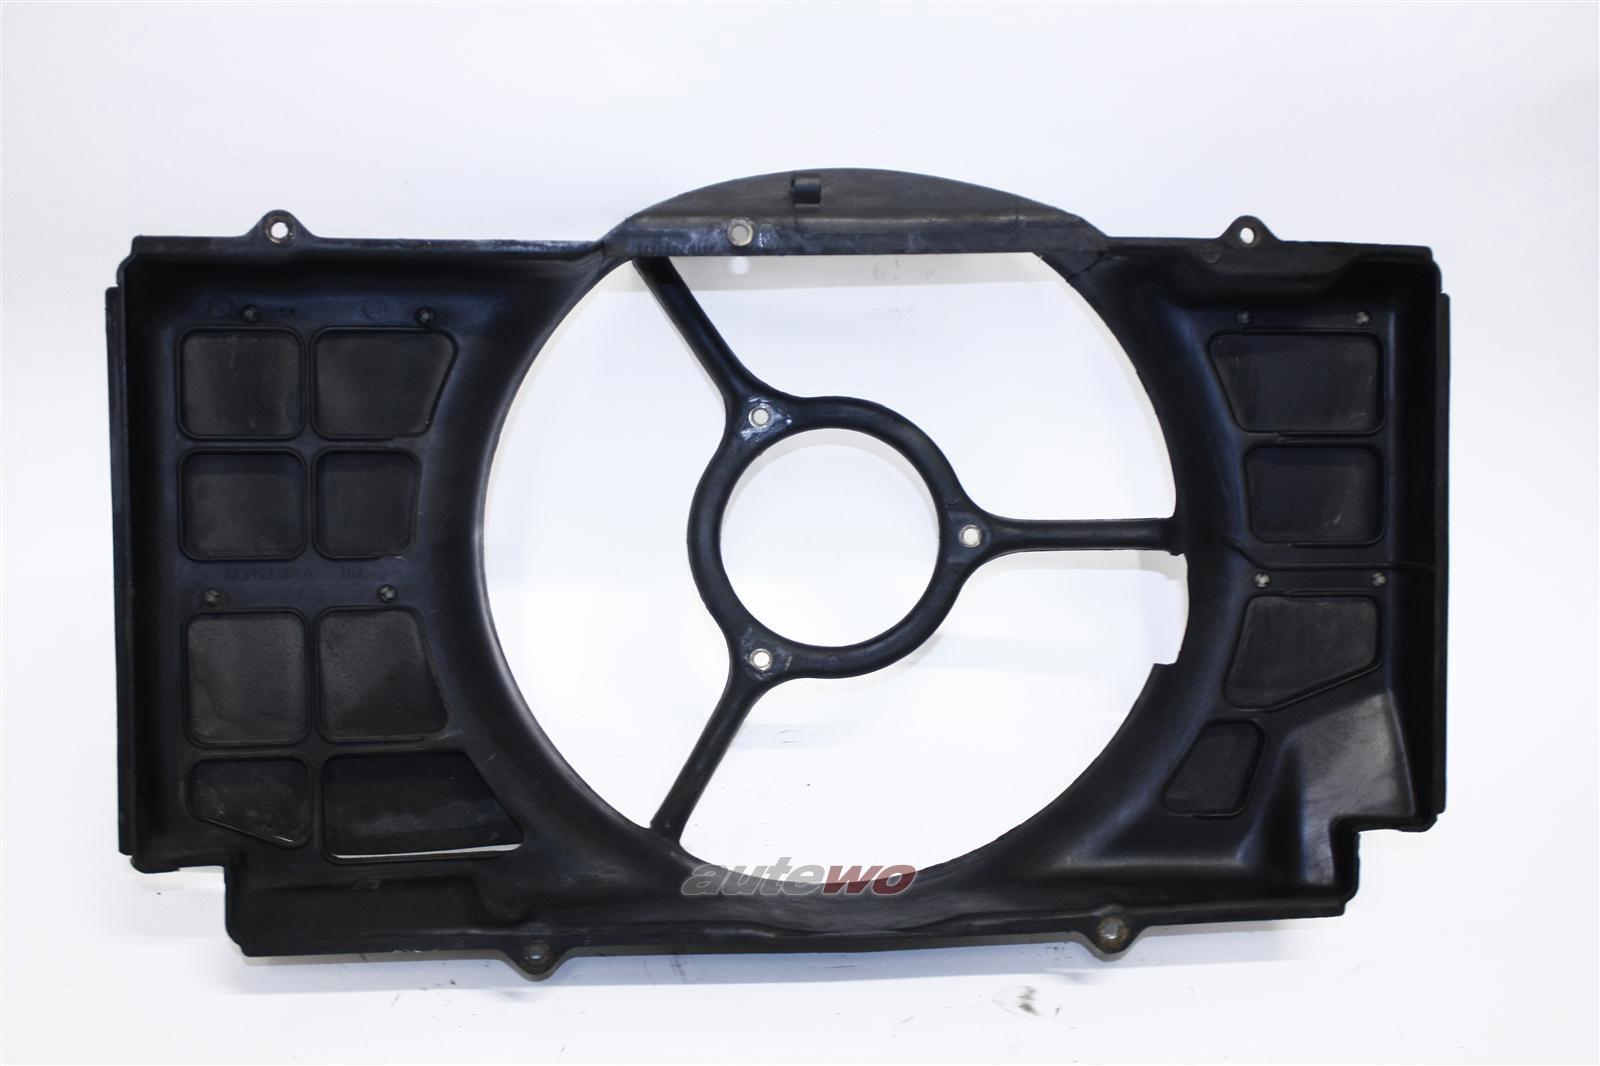 Audi 100/200 Typ 44 2.0-2.3l Lüfterring für Lüfter 500 Watt 443121207A